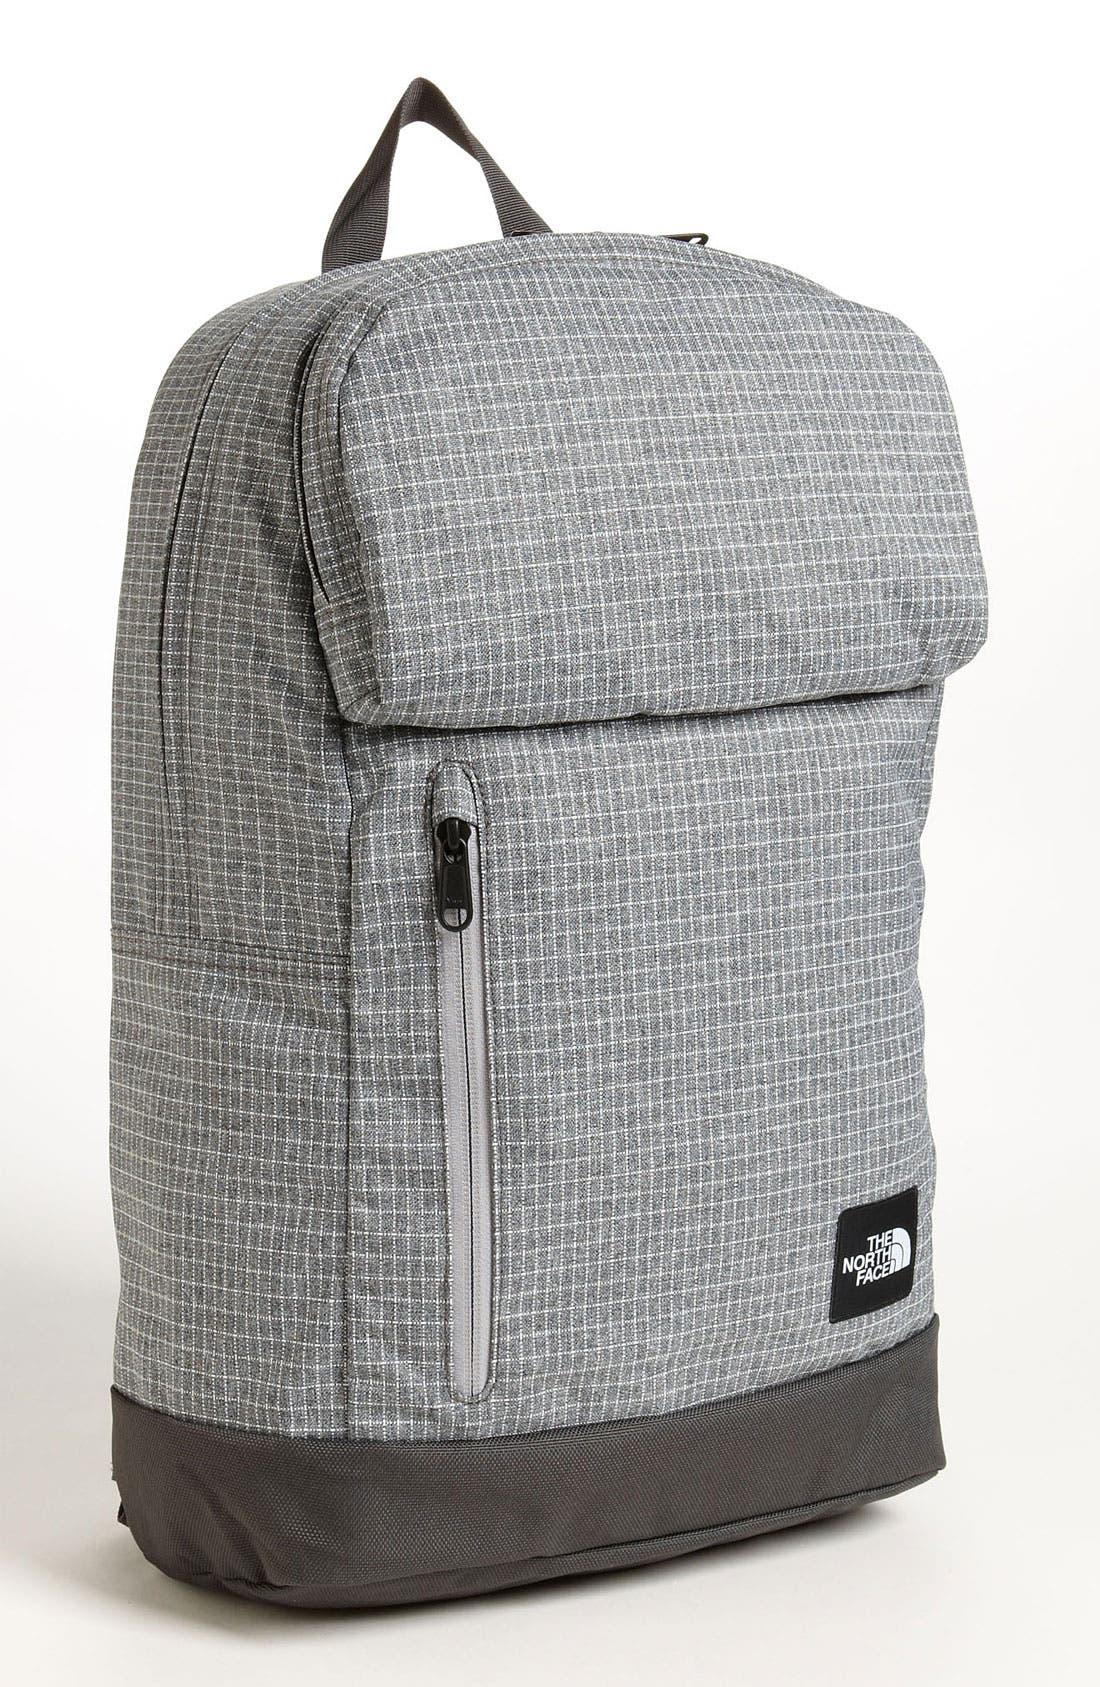 Main Image - The North Face 'Singletasker' Backpack